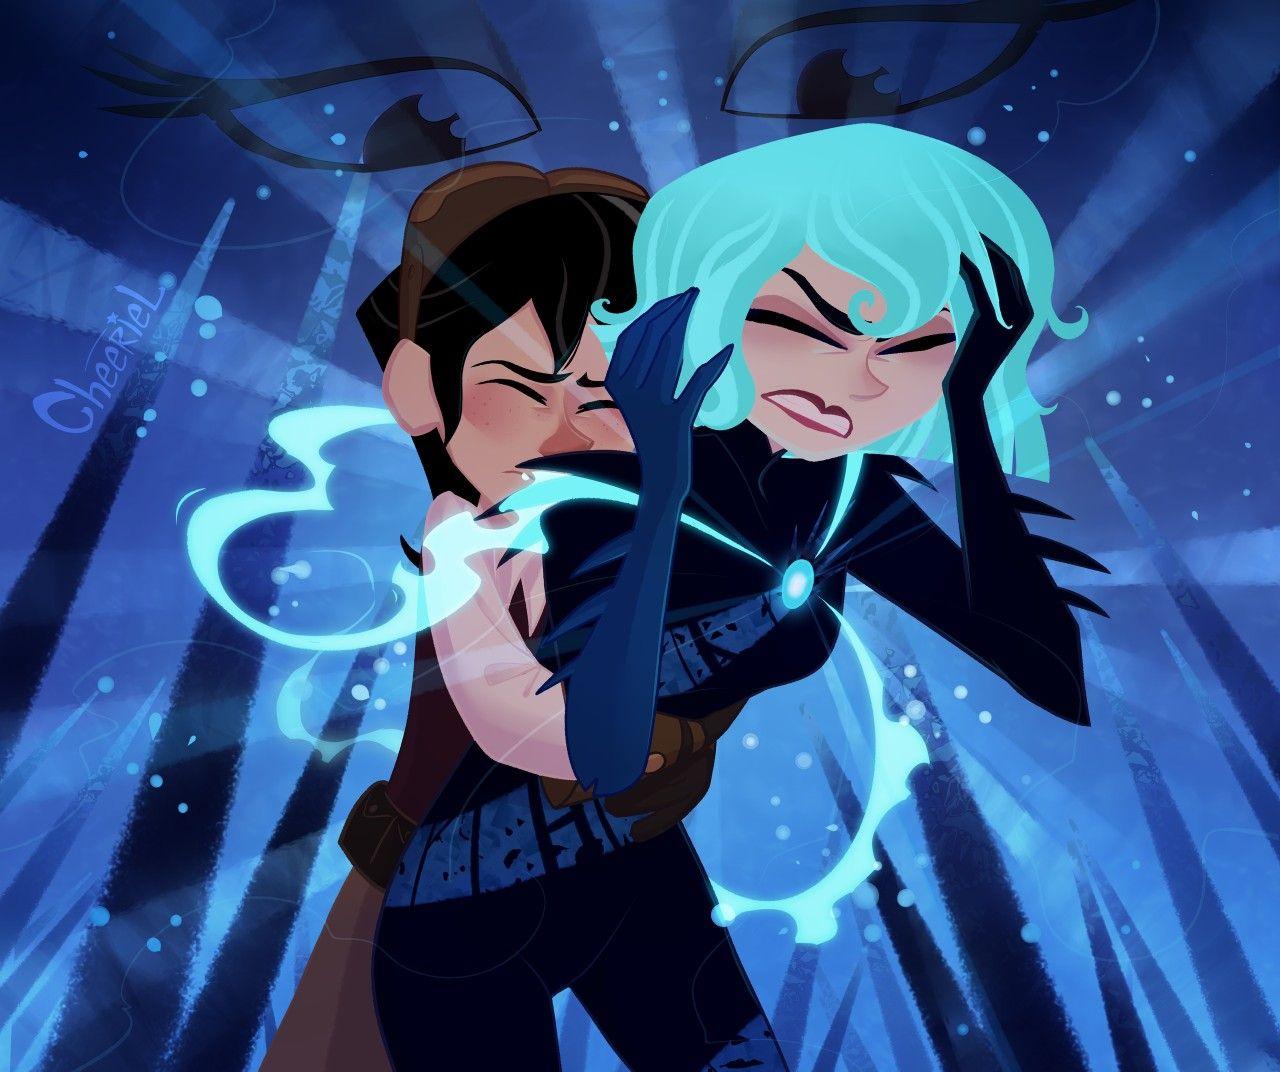 Pin By Cate On Rapuncel Novaya Istoriya Tangled The Series In 2020 Cassandra Tangled Disney Tangled Tangled